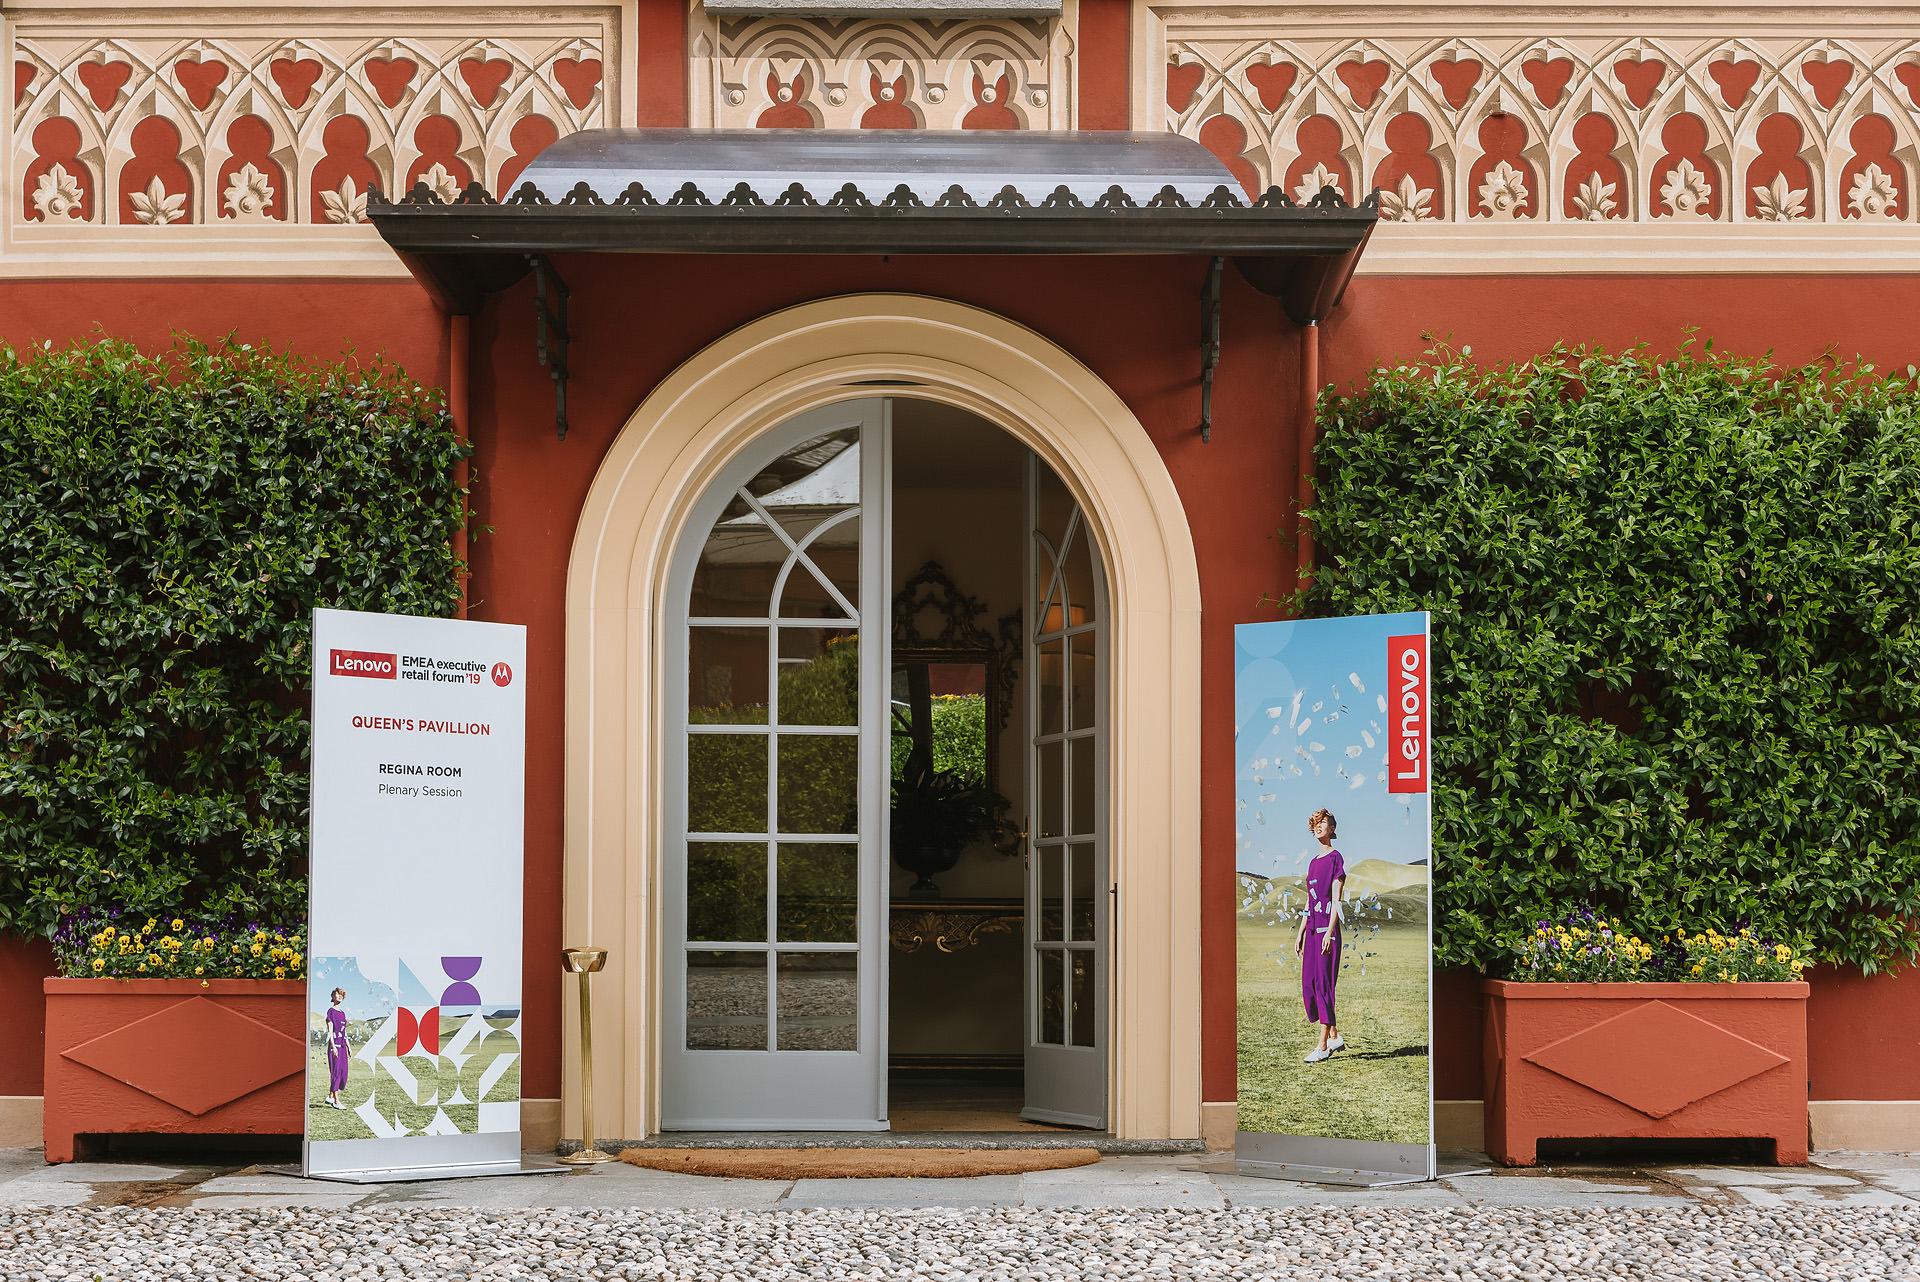 emea-executive-retail-forum-gruppo-peroni-eventi-00